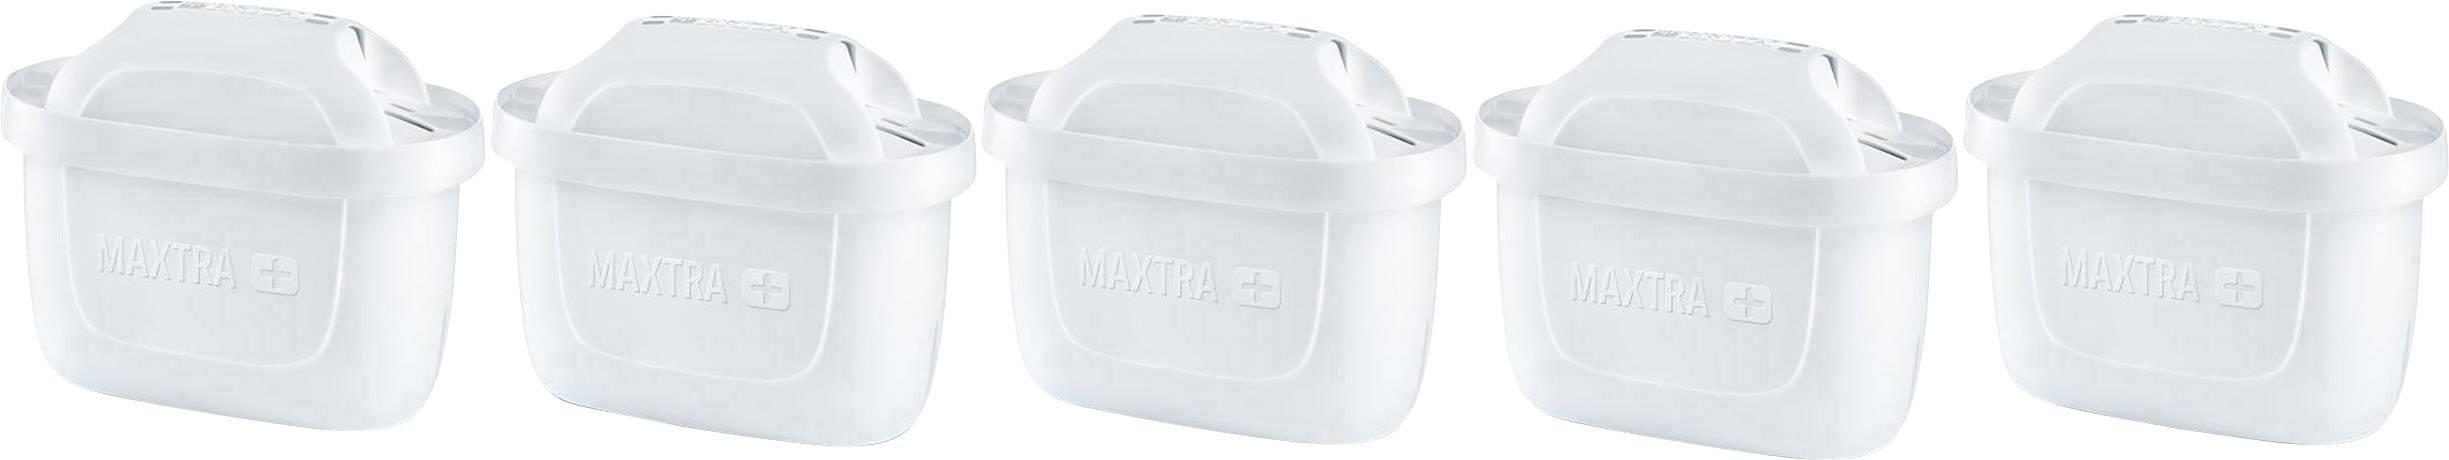 Brita  MAXTRA+-5 kartuša filtra  bela